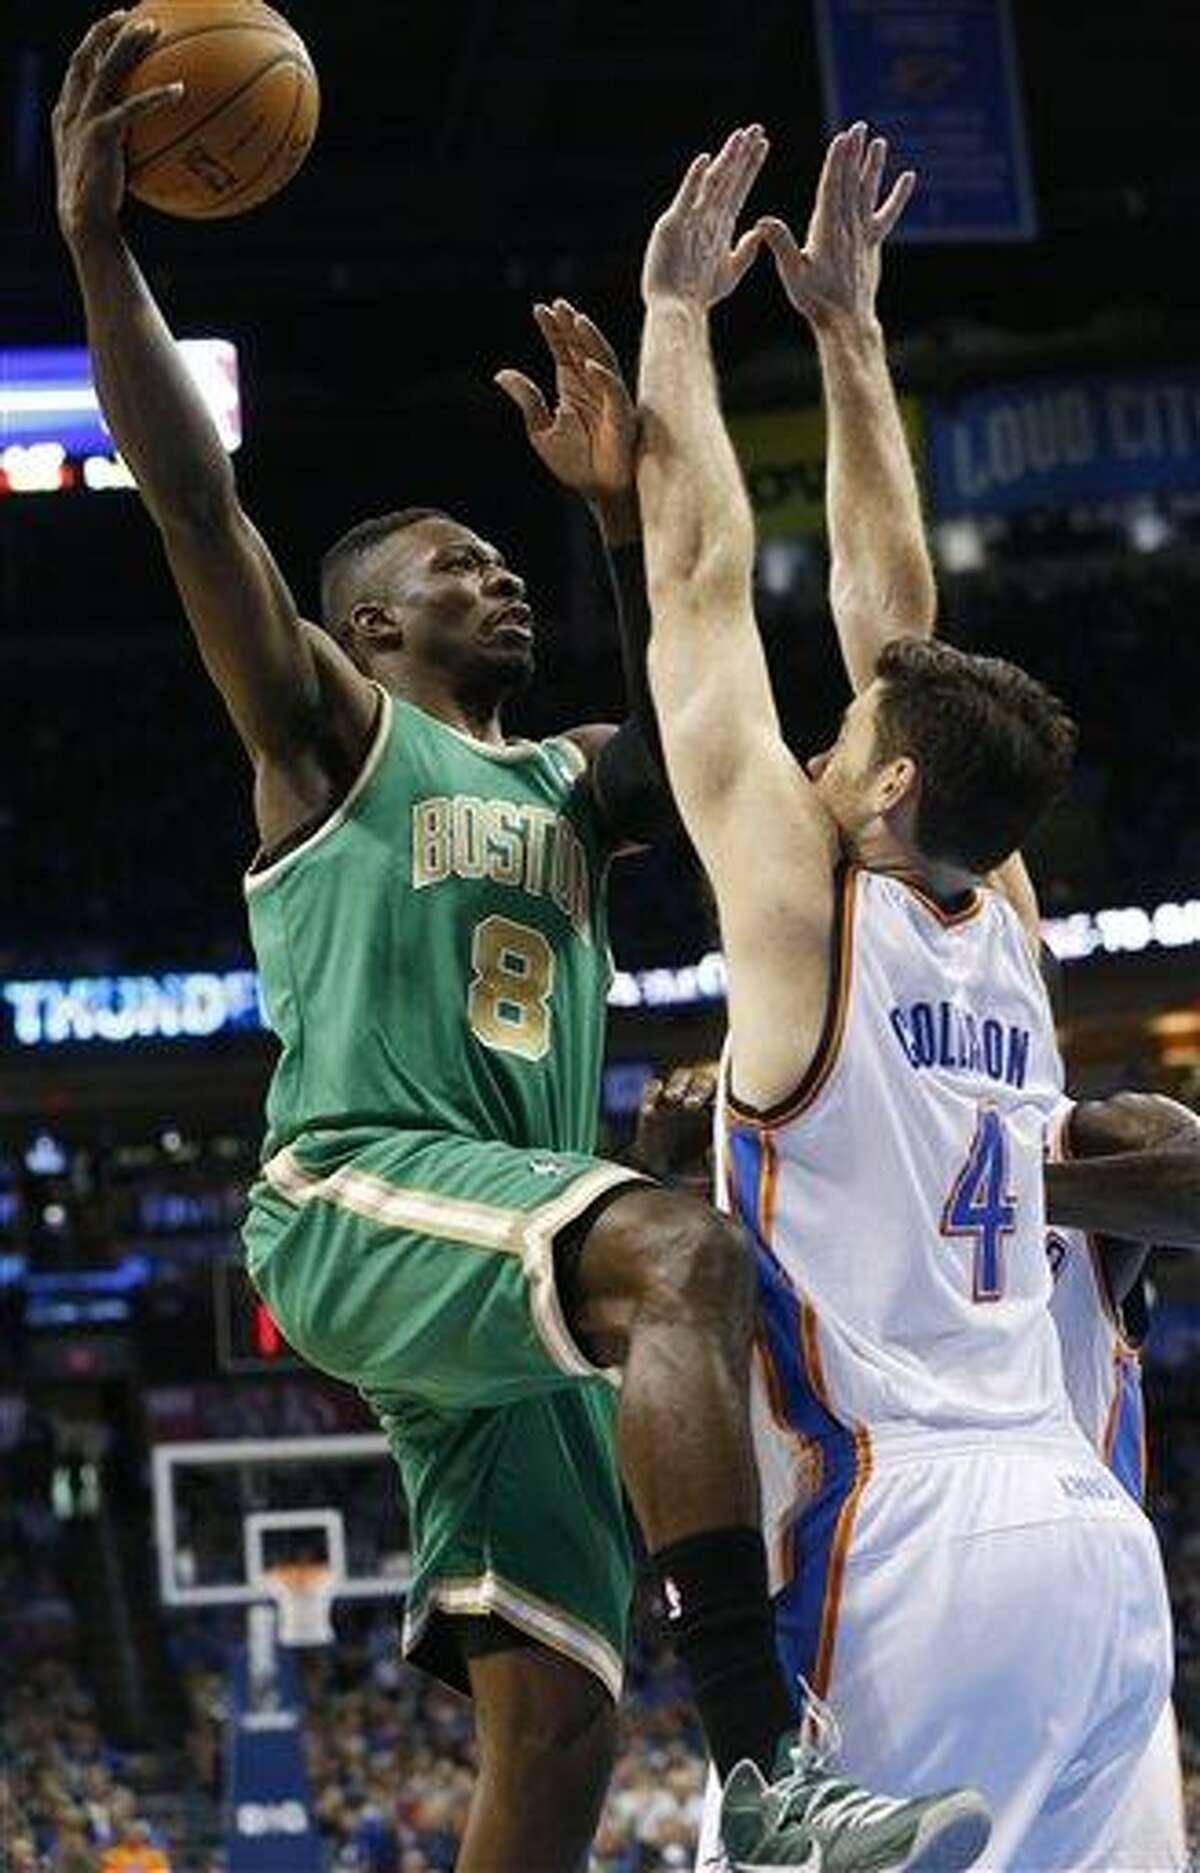 Boston Celtics forward Jeff Green (8) shoots as Oklahoma City Thunder forward Nick Collison (4) defends in the first quarter of an NBA basketball game in Oklahoma City, Sunday, March 10, 2013. Oklahoma City won 91-79 (AP Photo/Sue Ogrocki)